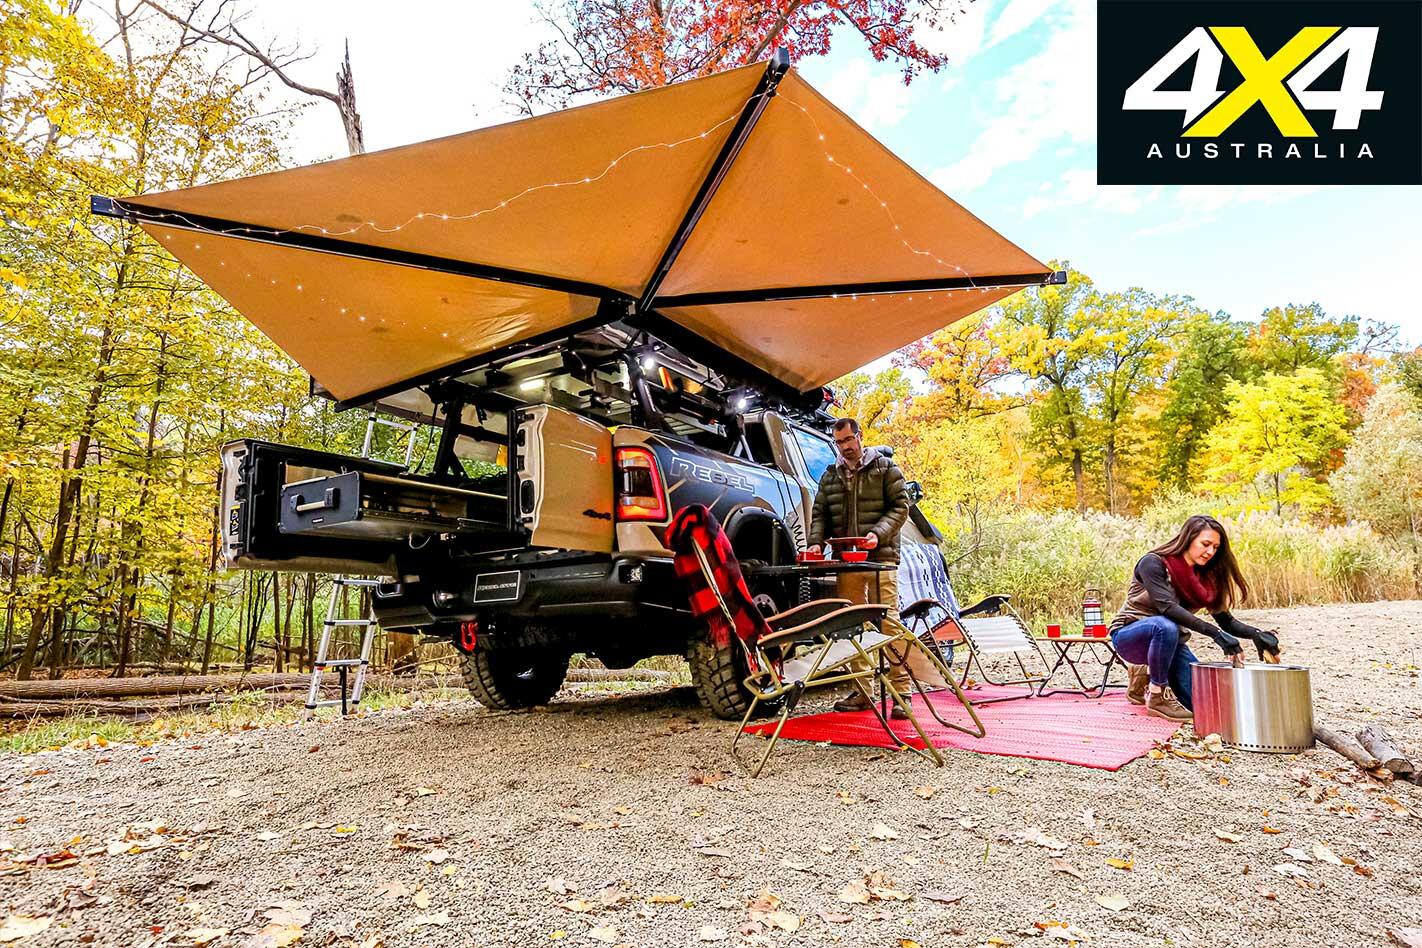 Ram 1500 Rebel OTG set up for camping